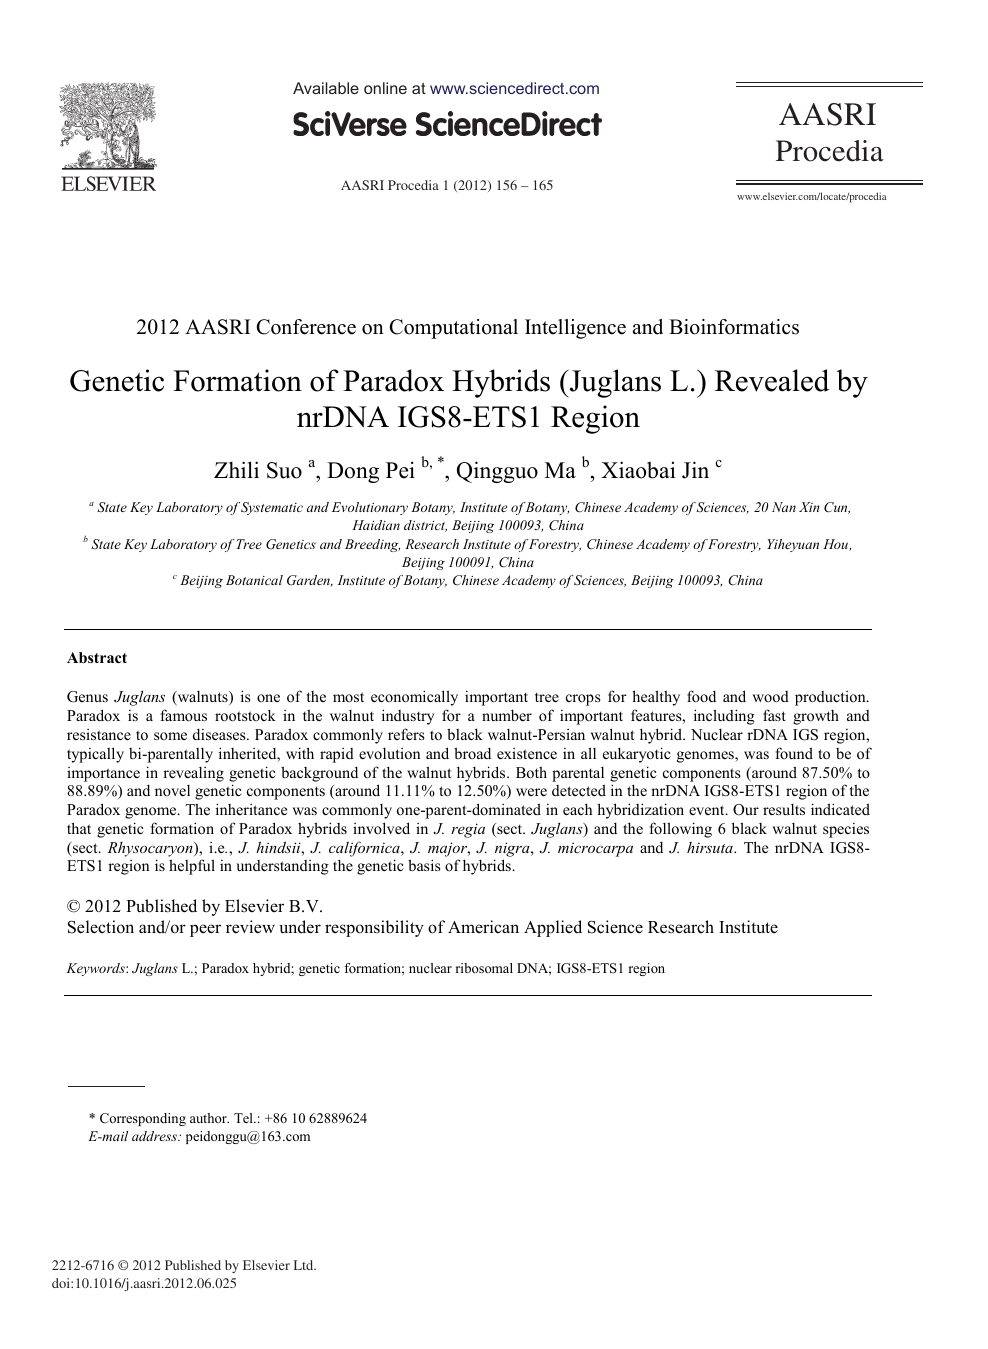 Genetic Formation of Paradox Hybrids (Juglans L ) Revealed